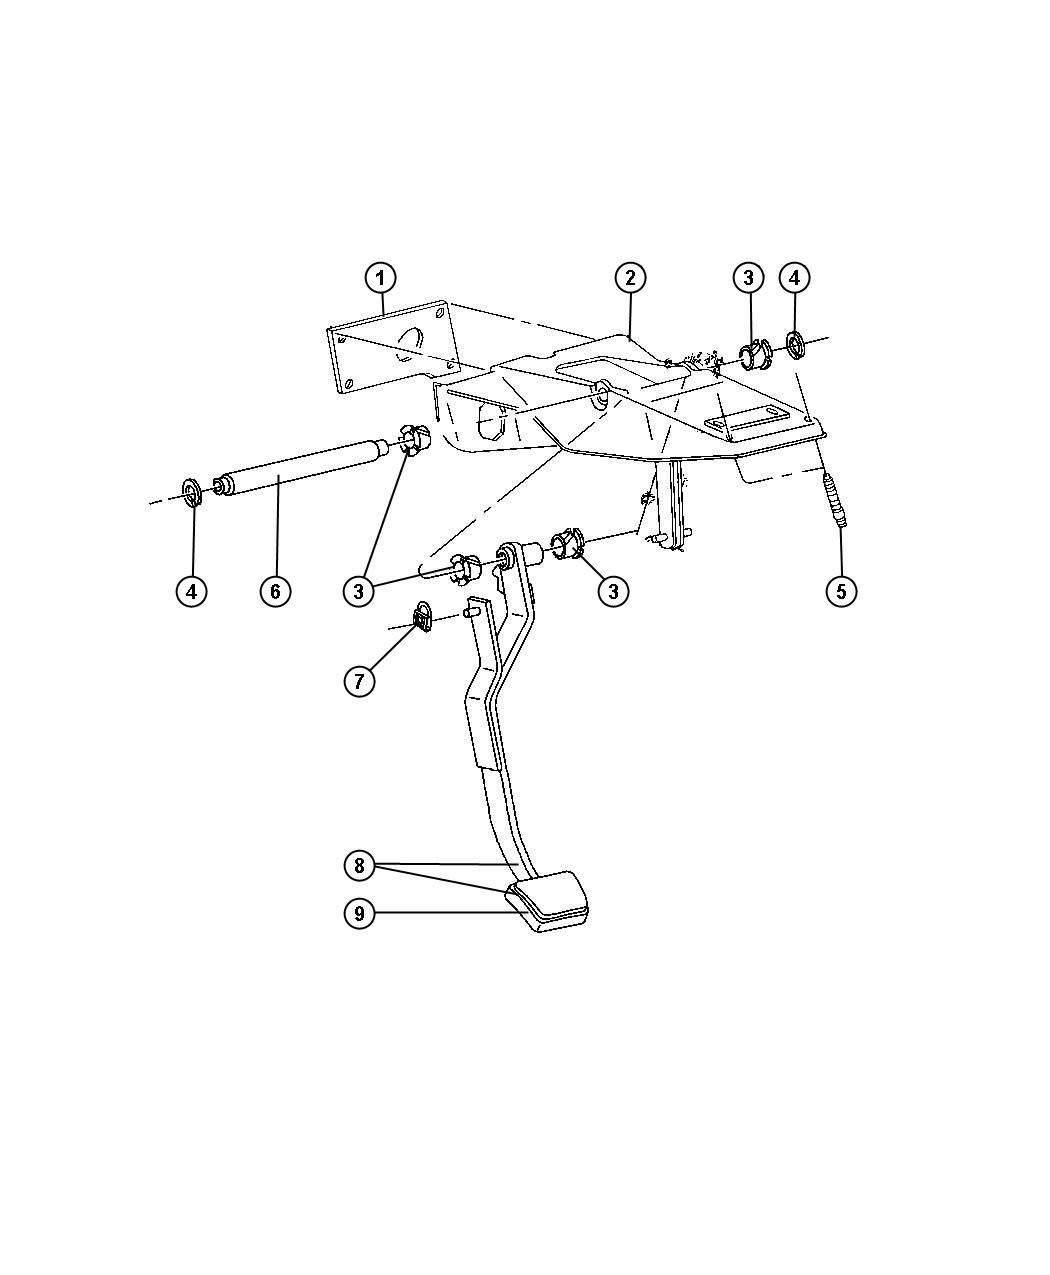 Dodge Ram Bracket Steering Column Used For Clutch